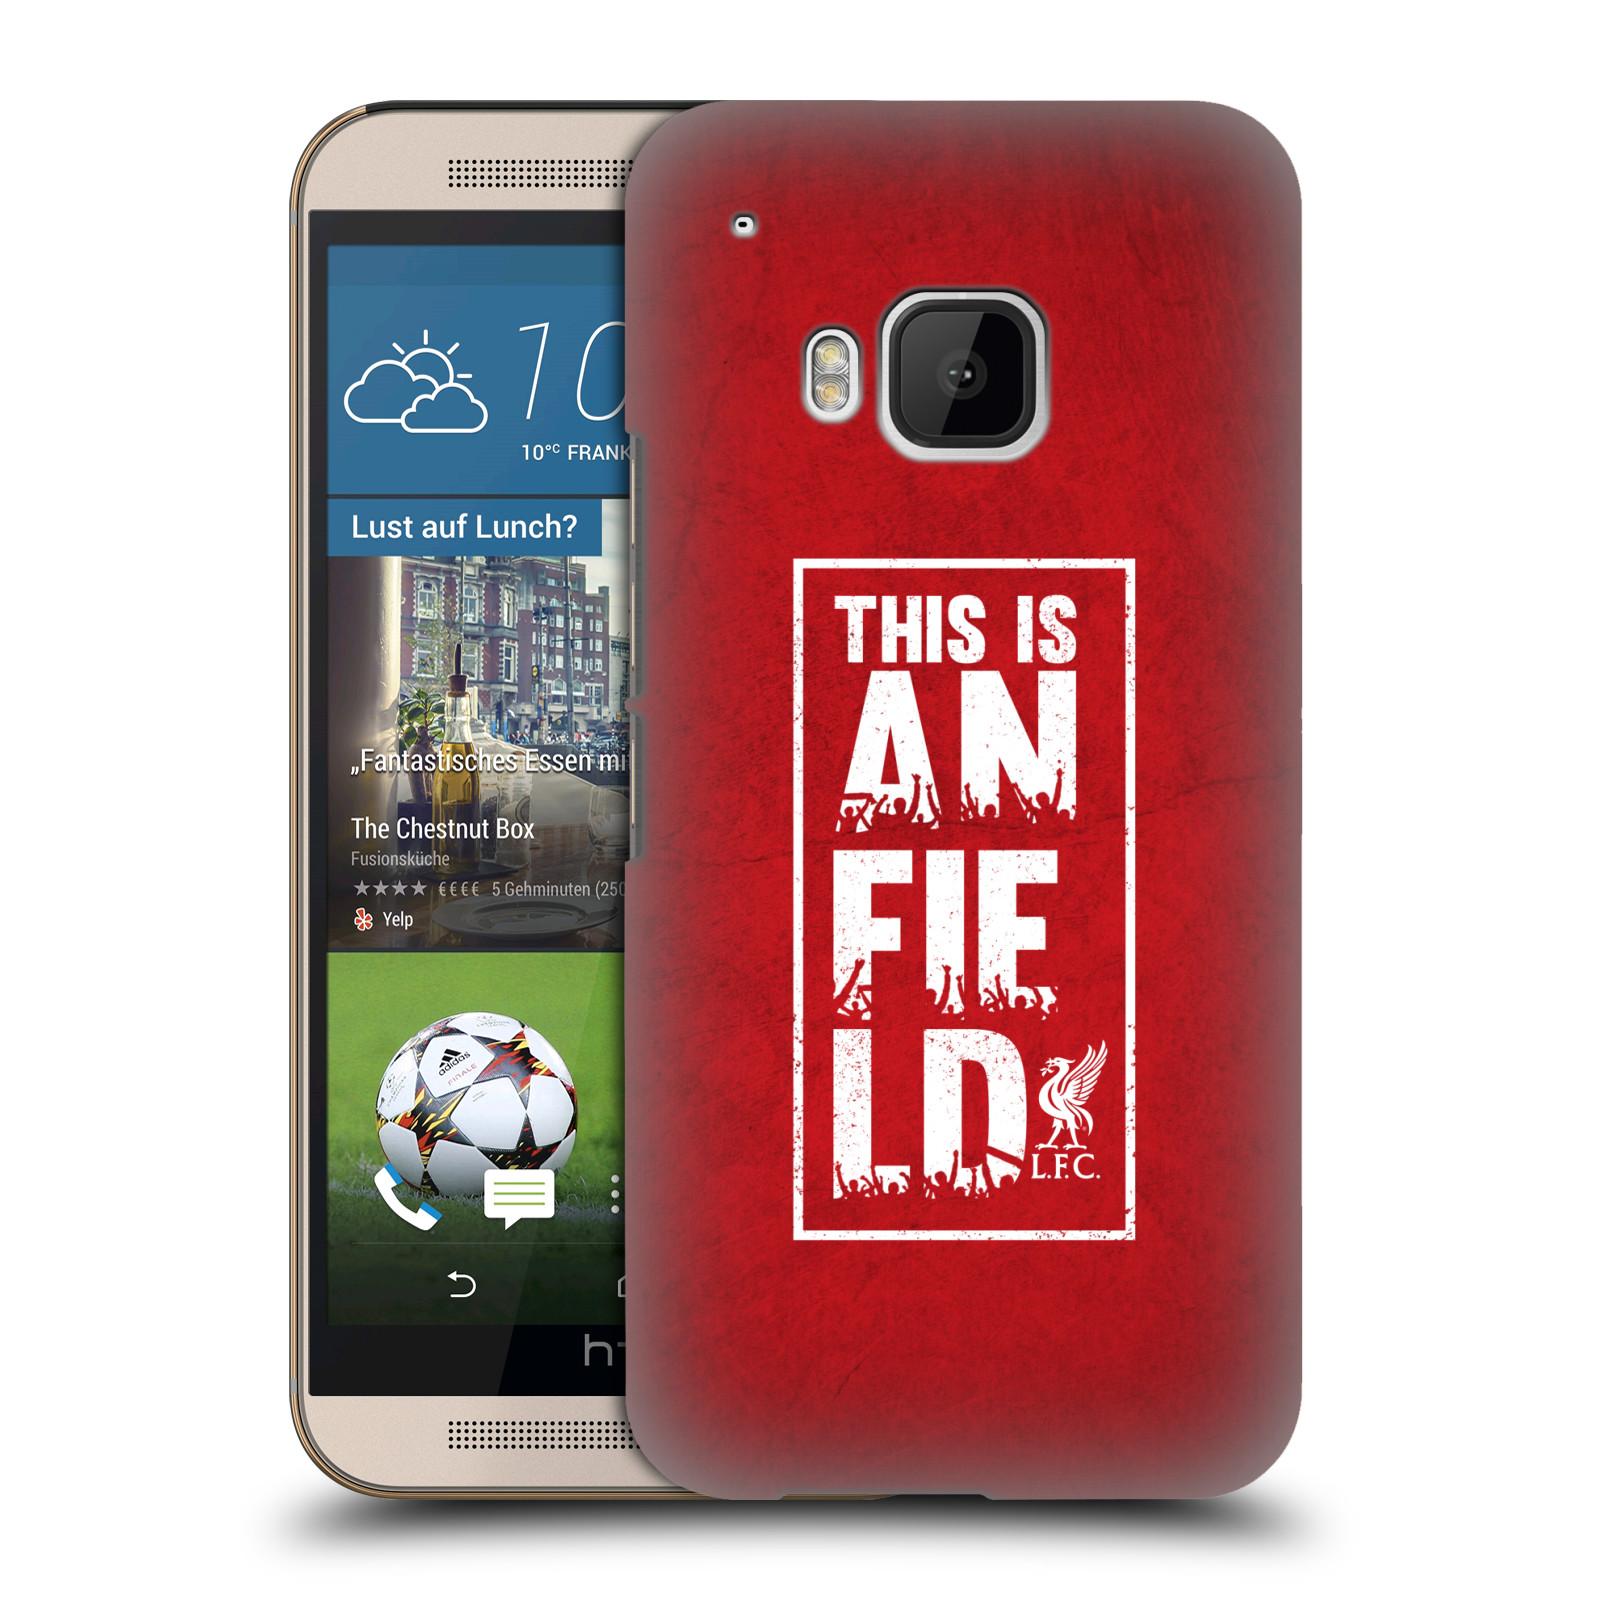 Plastové pouzdro na mobil HTC ONE M9 HEAD CASE Liverpool FC This Is Anfield Red (Kryt či obal na mobilní telefon Liverpool FC Official pro HTC ONE M9)